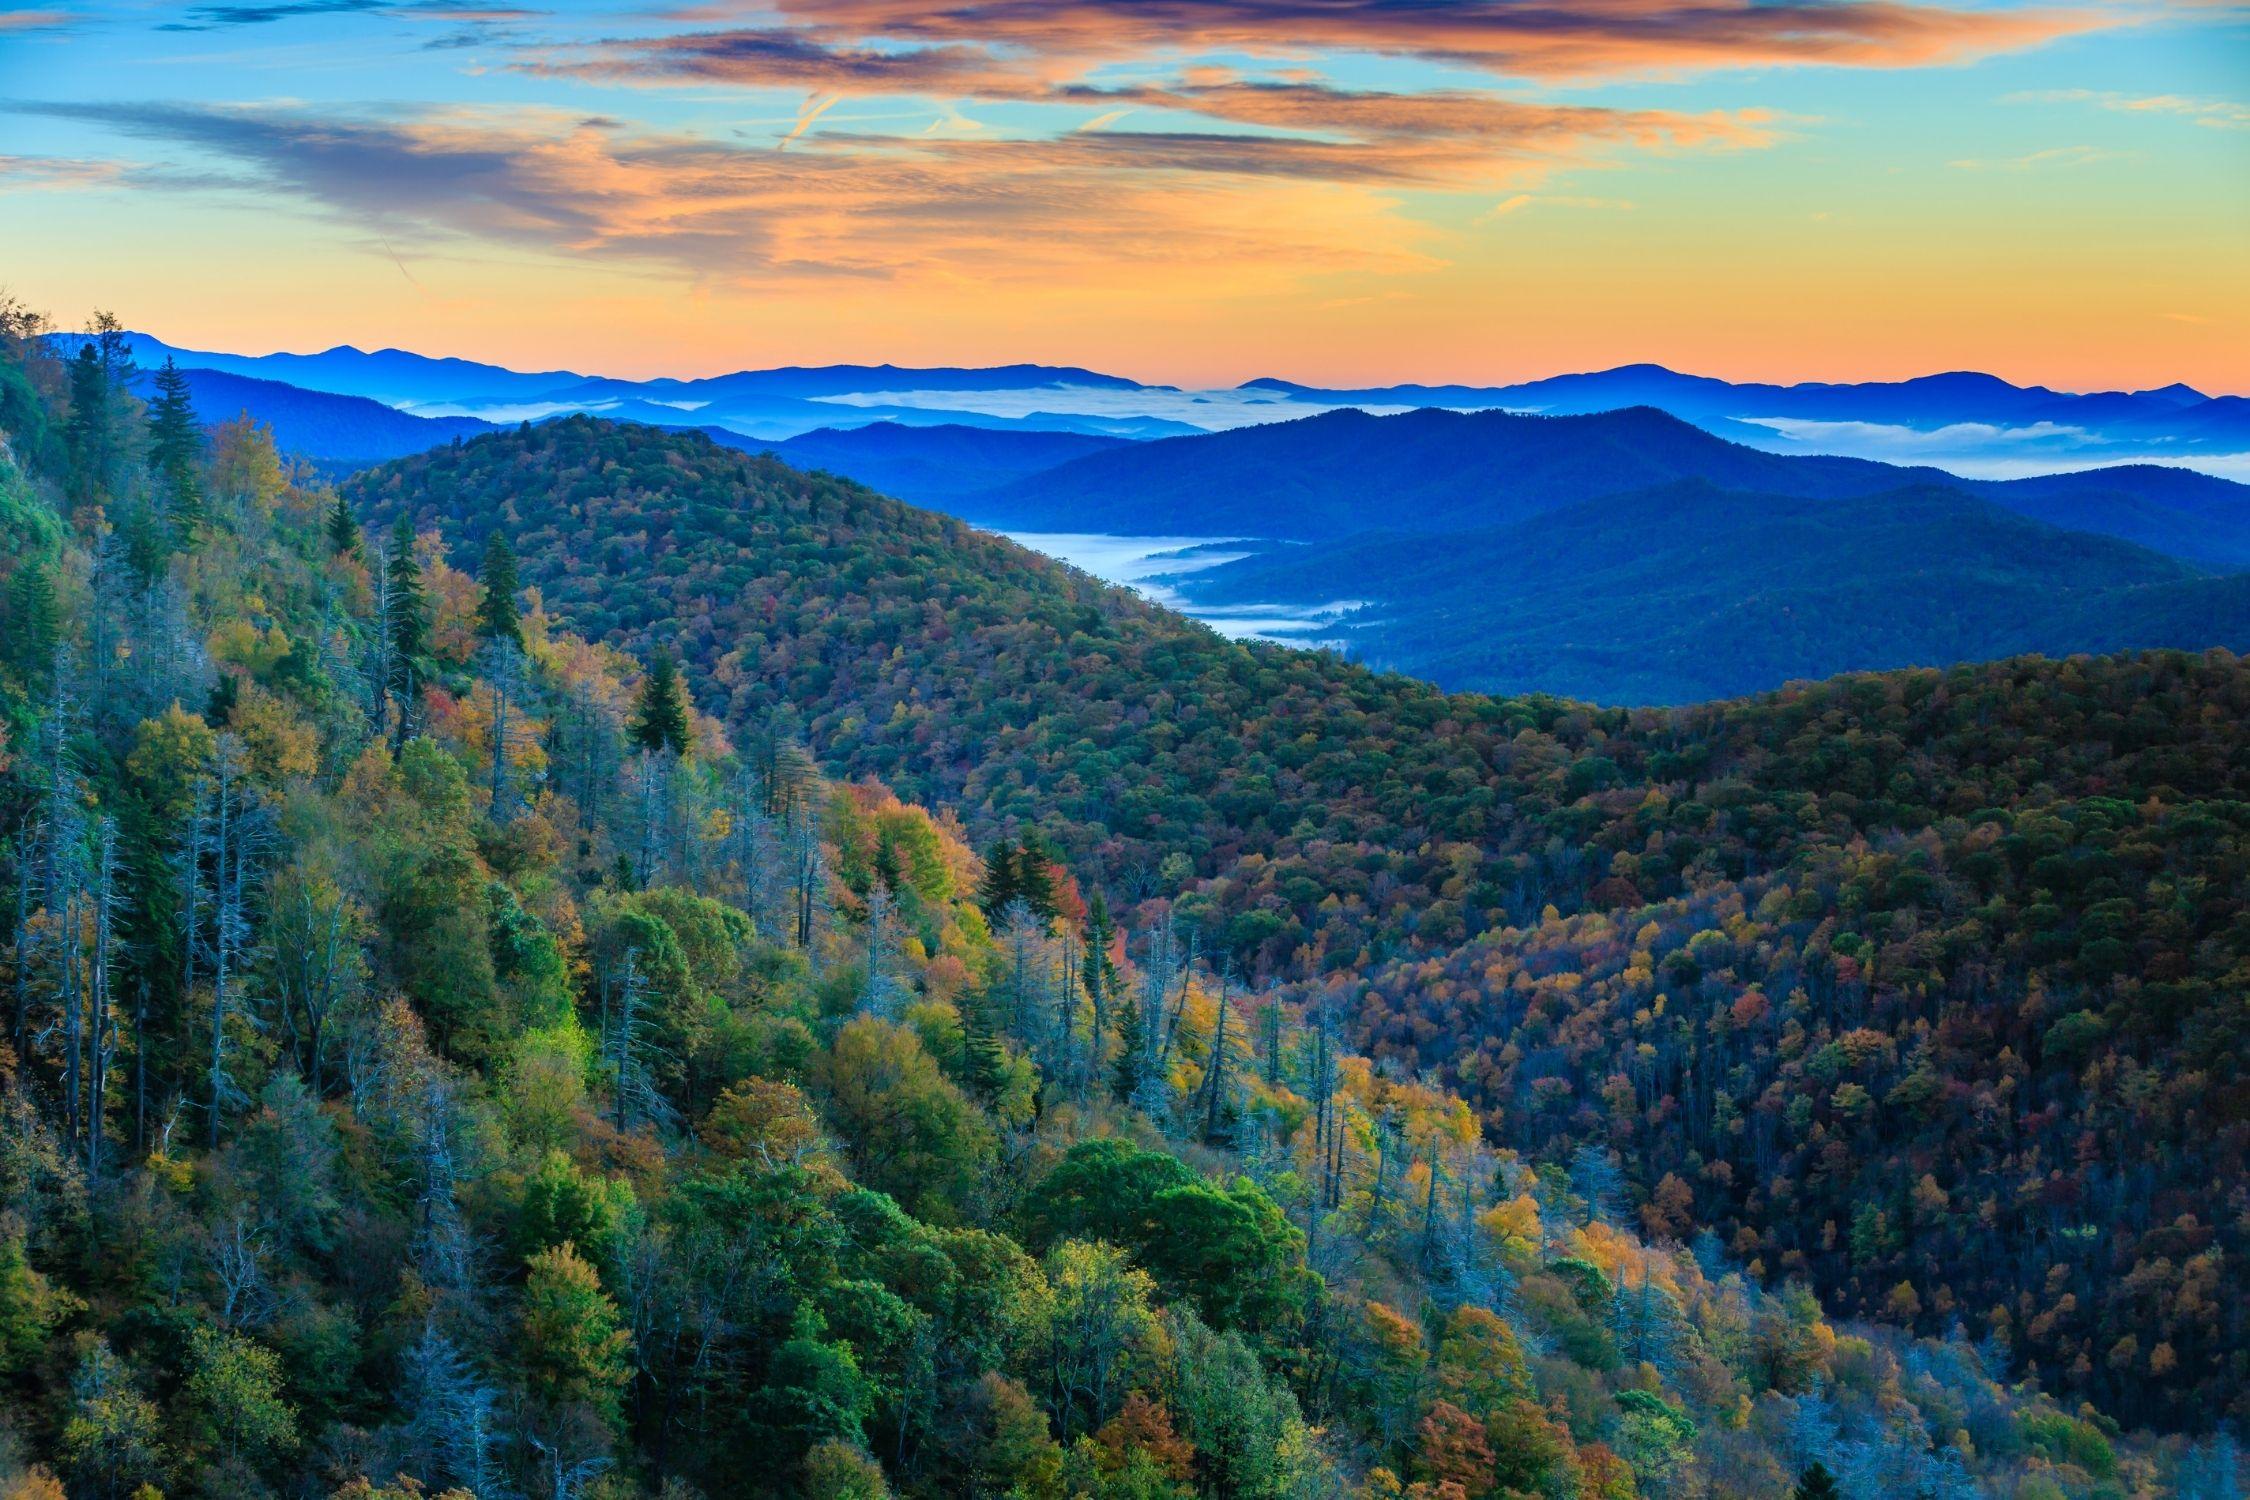 North Carolina National Parks - Smoky Mountains